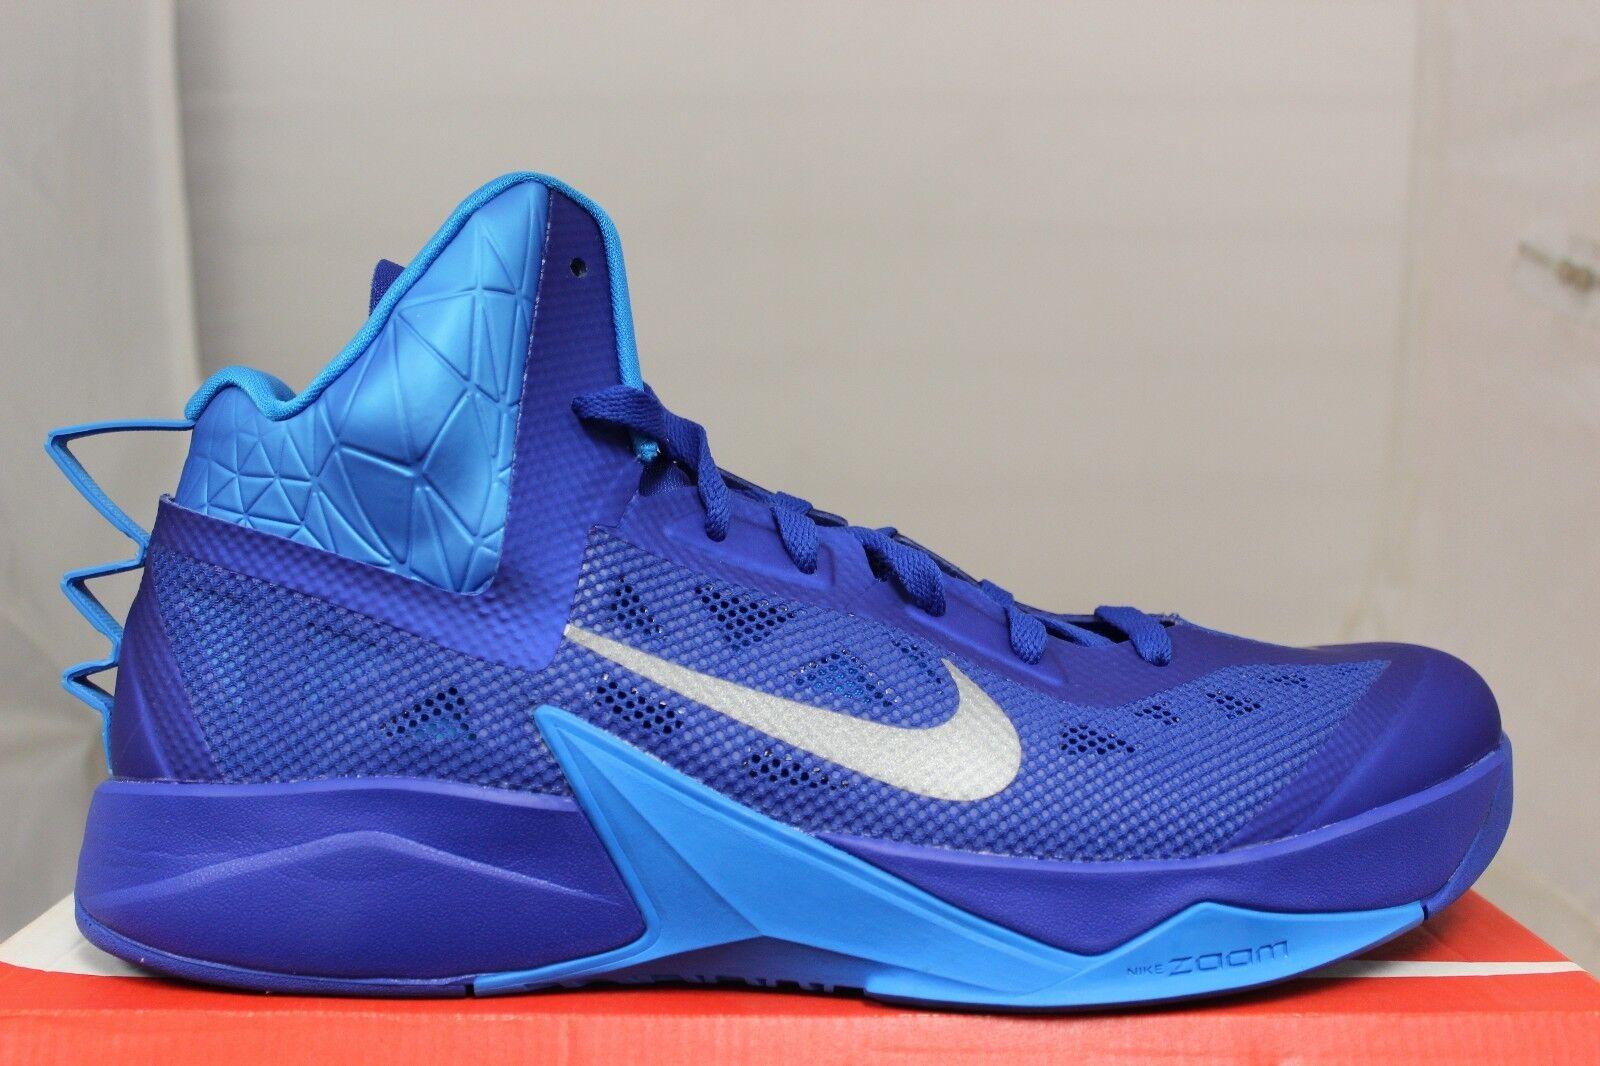 Nike Zoom Hyperfuse 2013 Tb 615496400 Royal Spiel Silber Brandneu